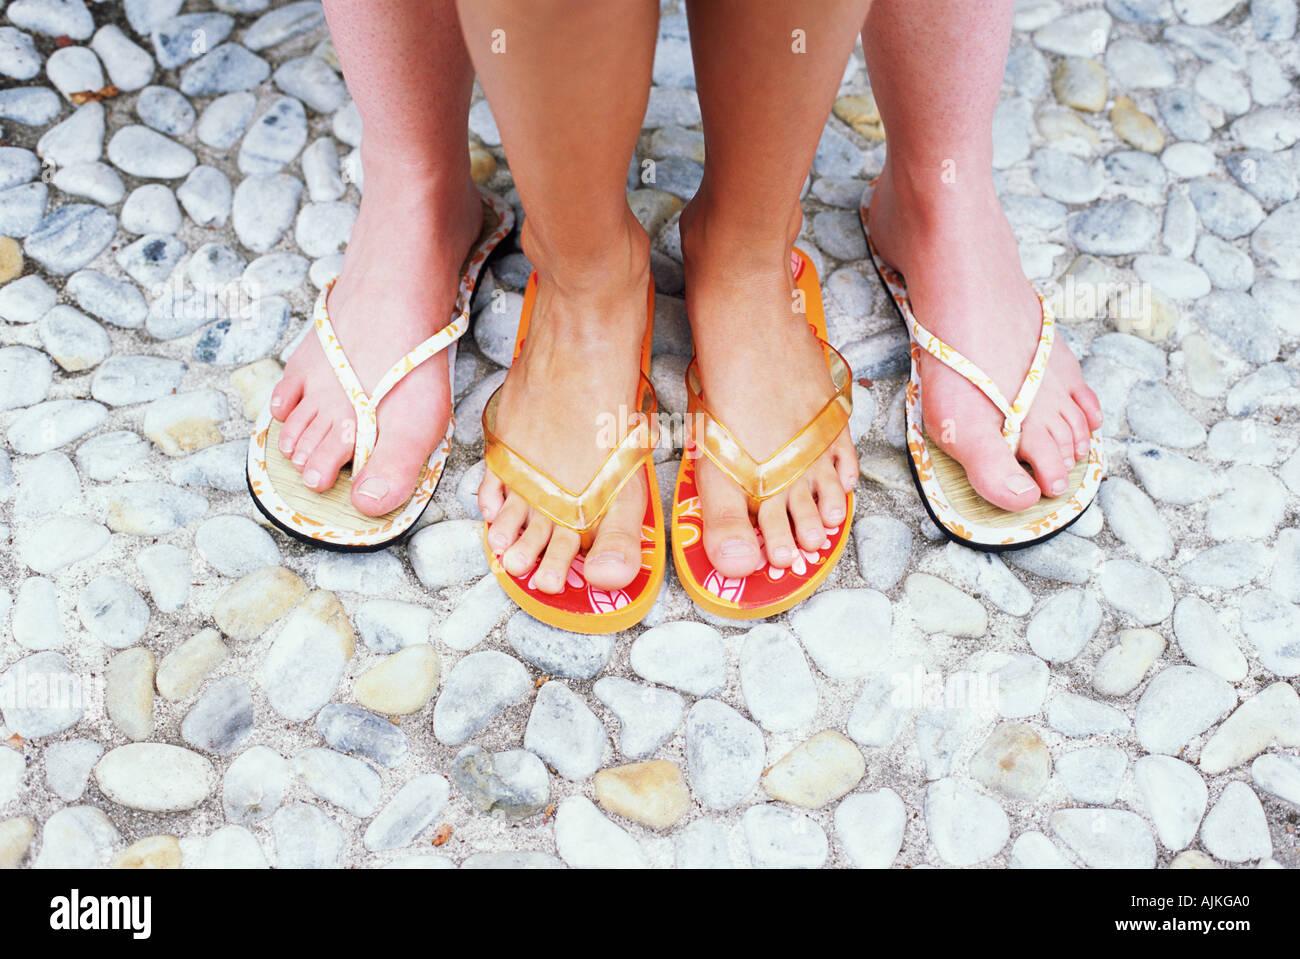 Feet in flip flops Stock Photo